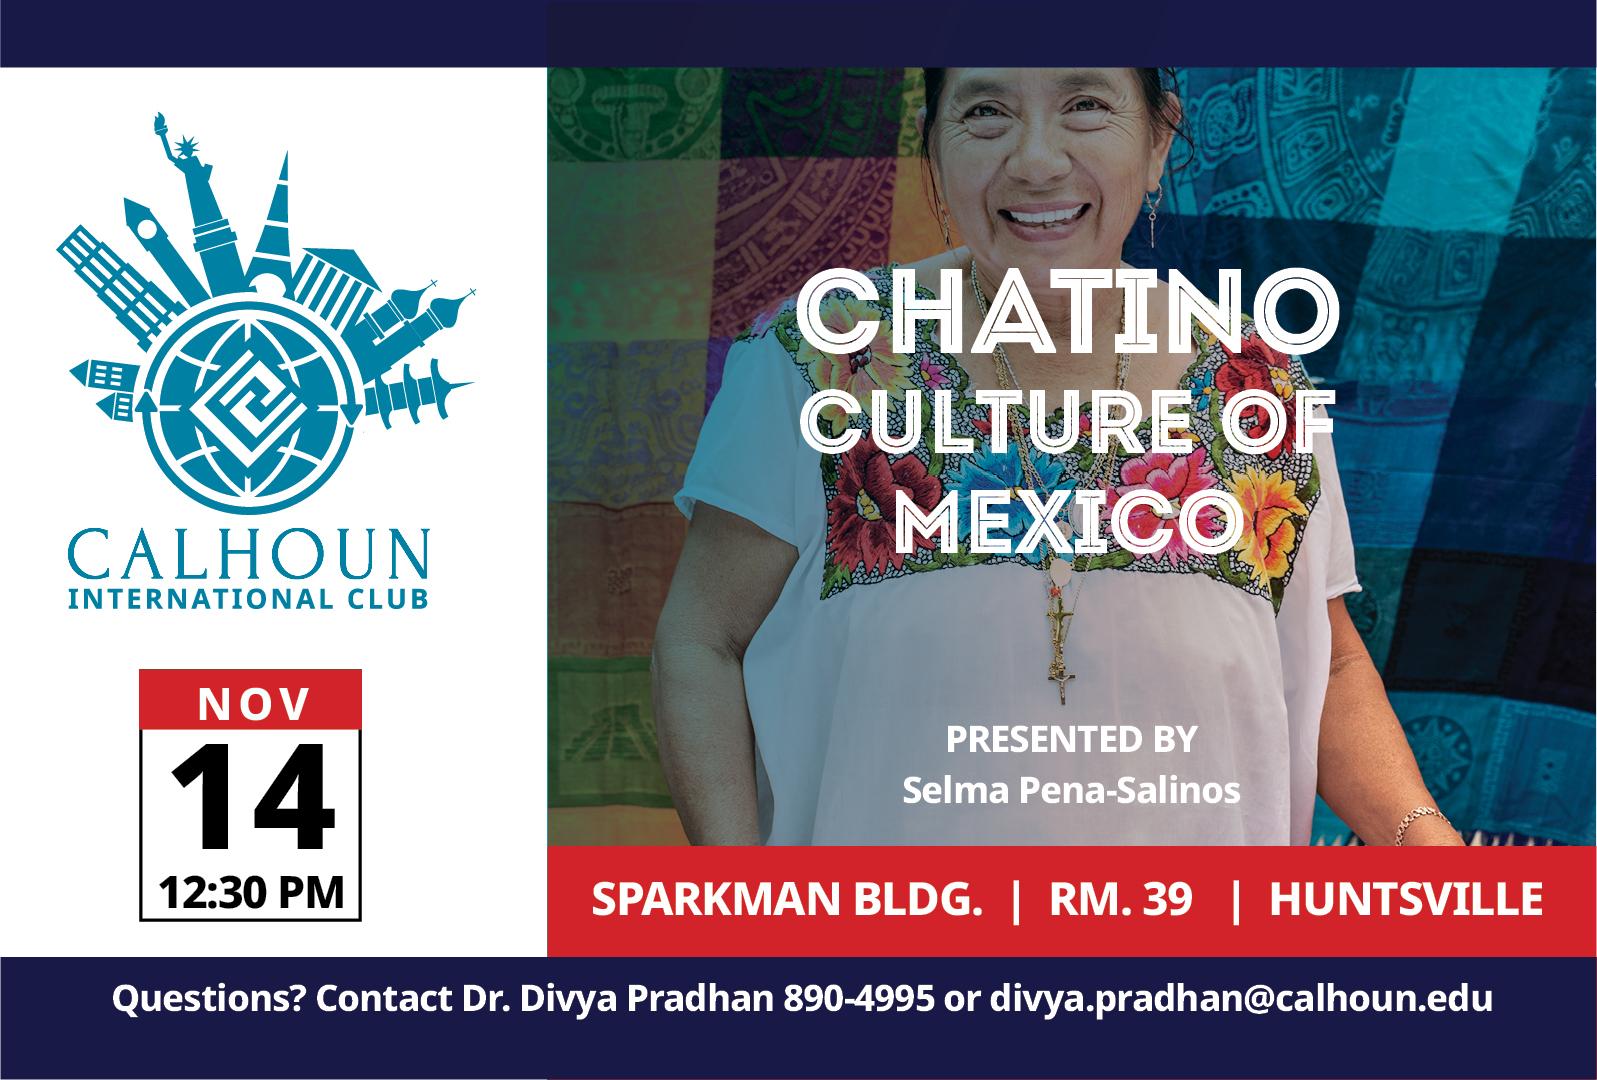 calhoun International Club Chatino culture of Mexico Nov 14 12:30 PM Sparkman Bldg. Rm. 39 Huntsille Questions? Contact Dr. Divya Pradham 890-4995 or divya.pradhan@calhoun.edu